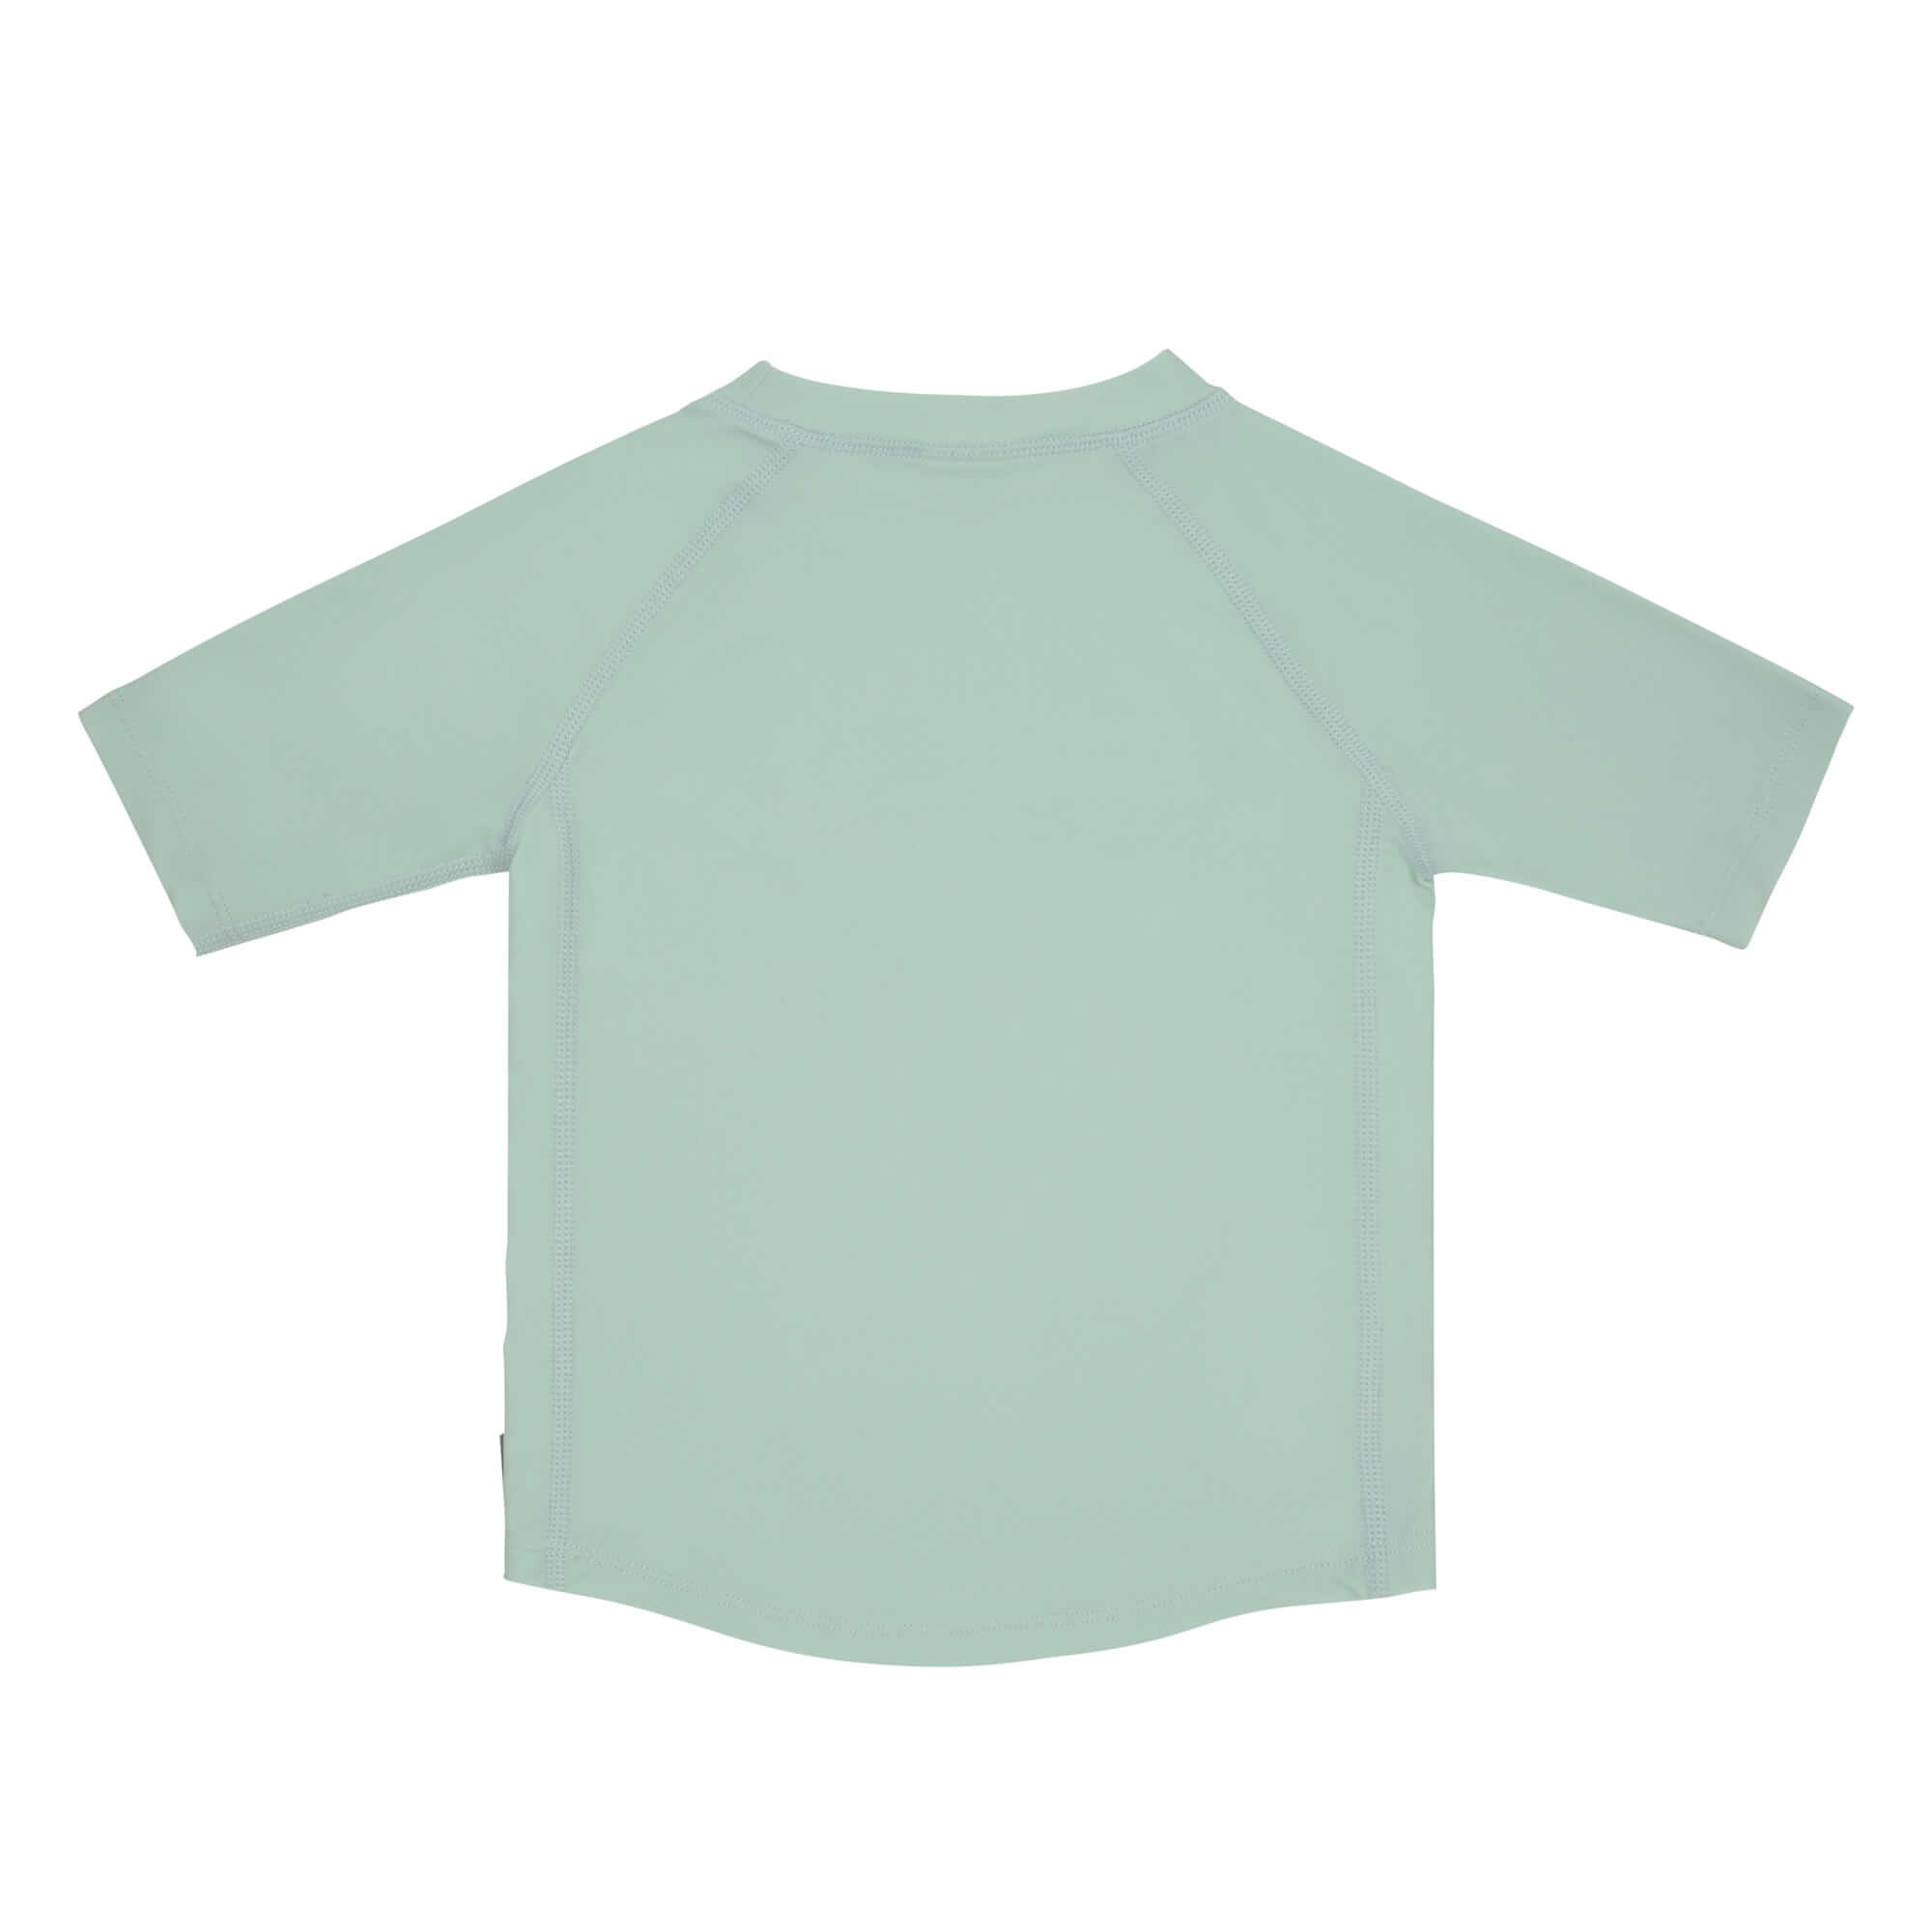 Lässig Lässig Splash & Fun Korte mouw Rashguard UV zwemshirt – Crocodile mint